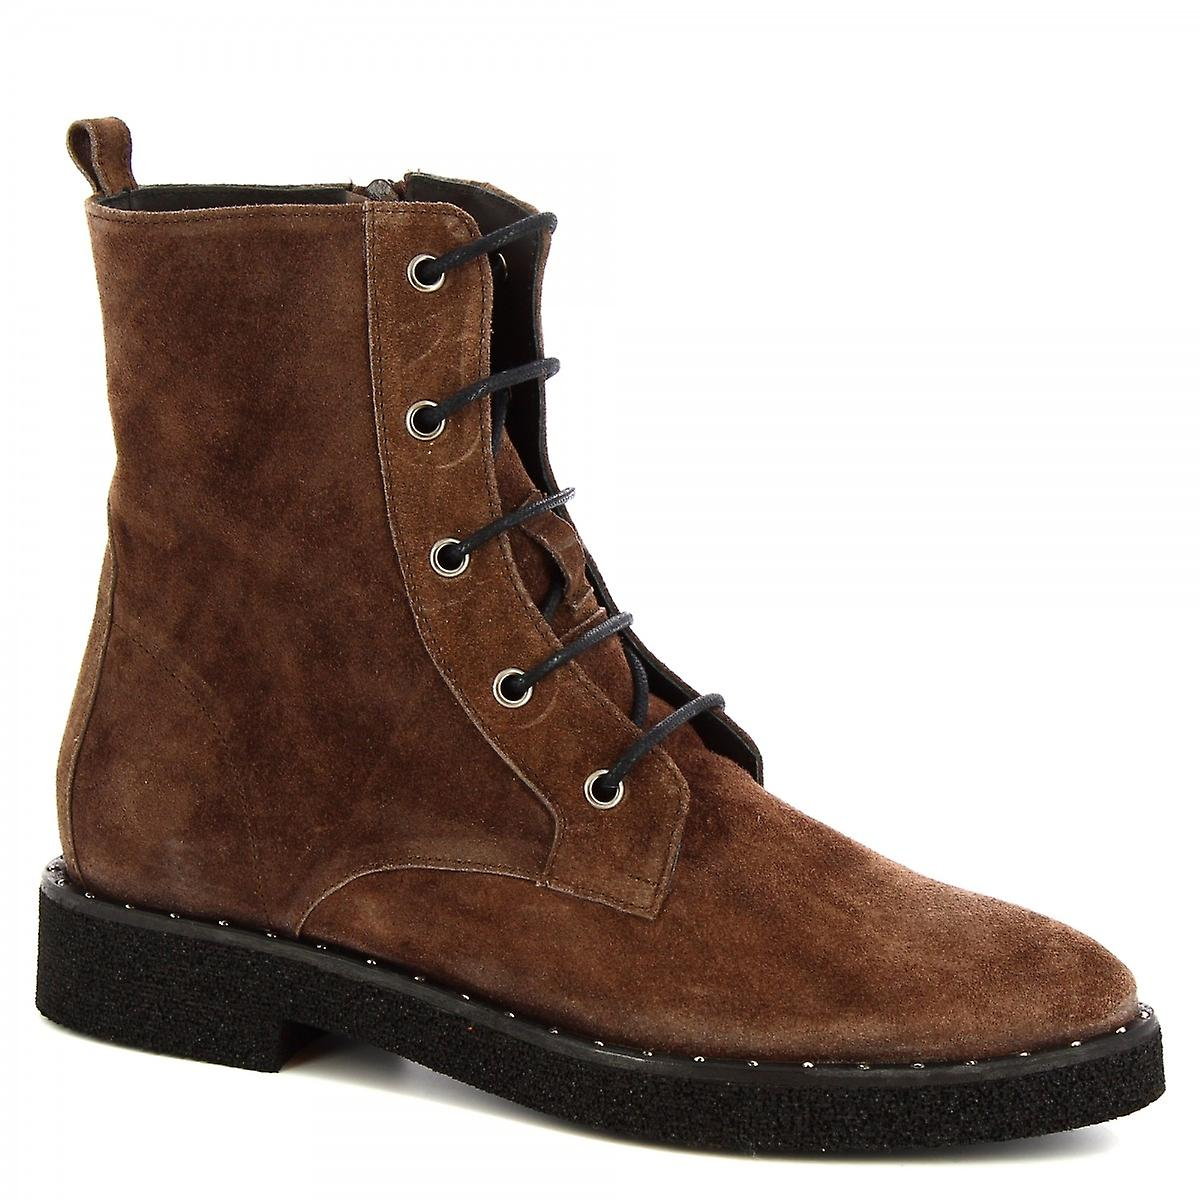 Women's handmade lace-ups boots in dark brown suede with side zip y3GCt